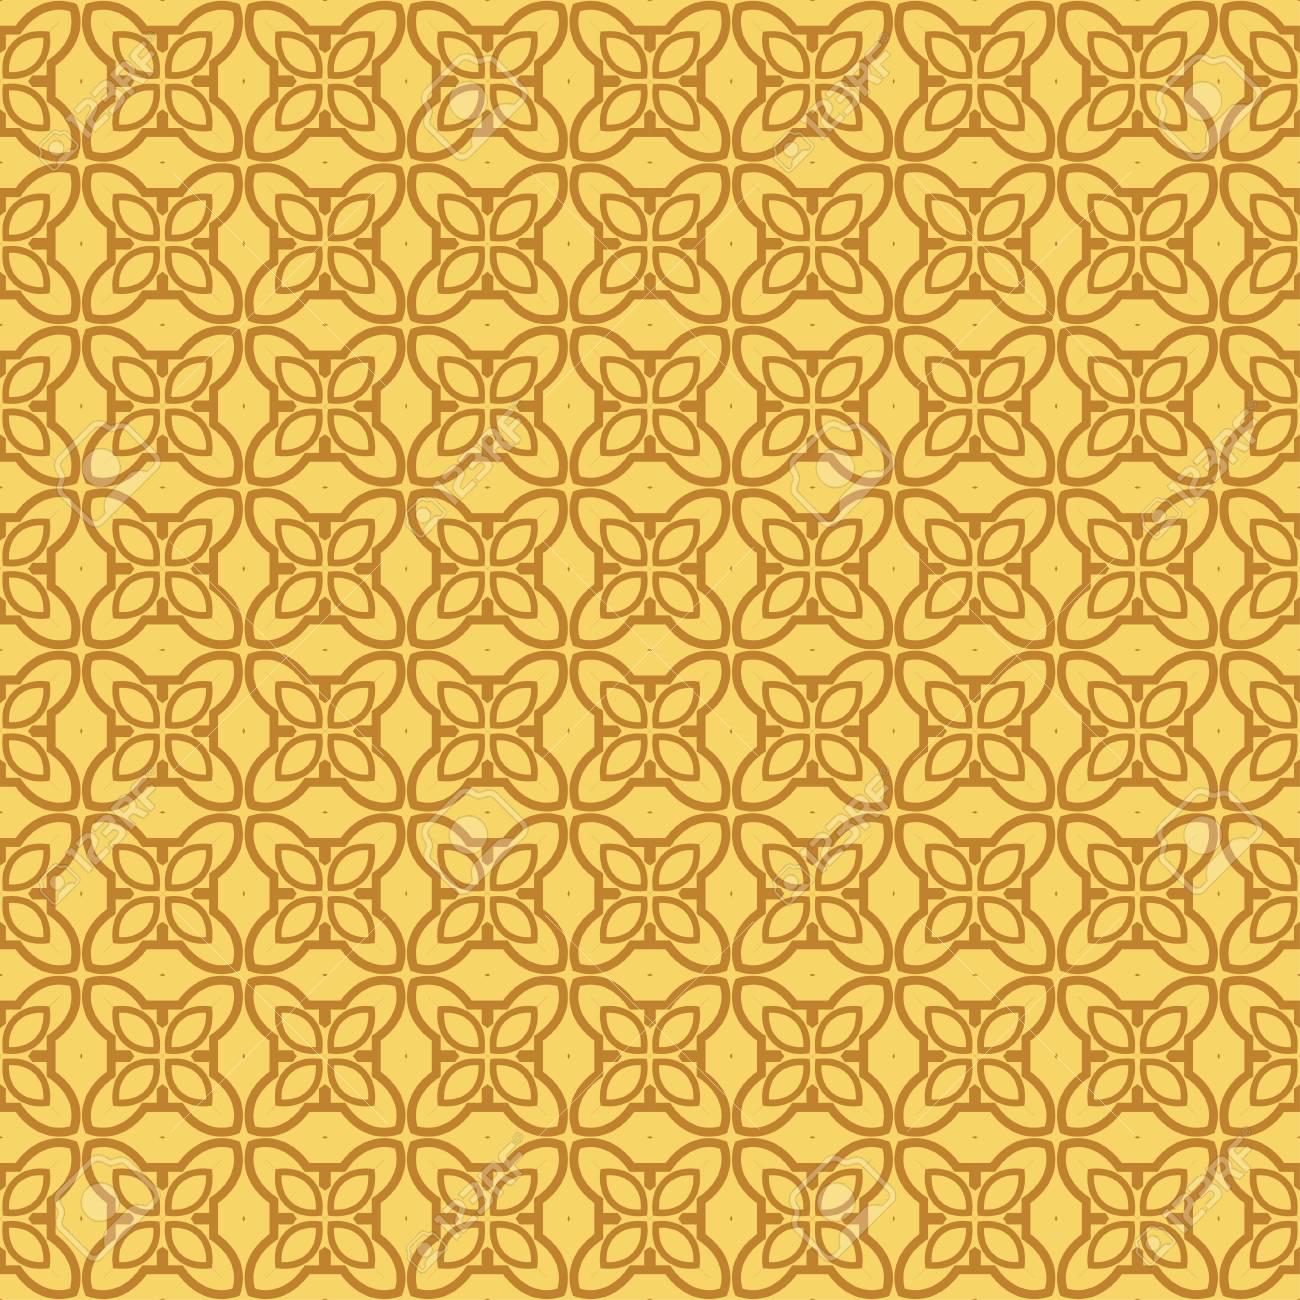 124925820 modern stylish geometry seamless pattern art deco background luxury texture for wallpaper invitation